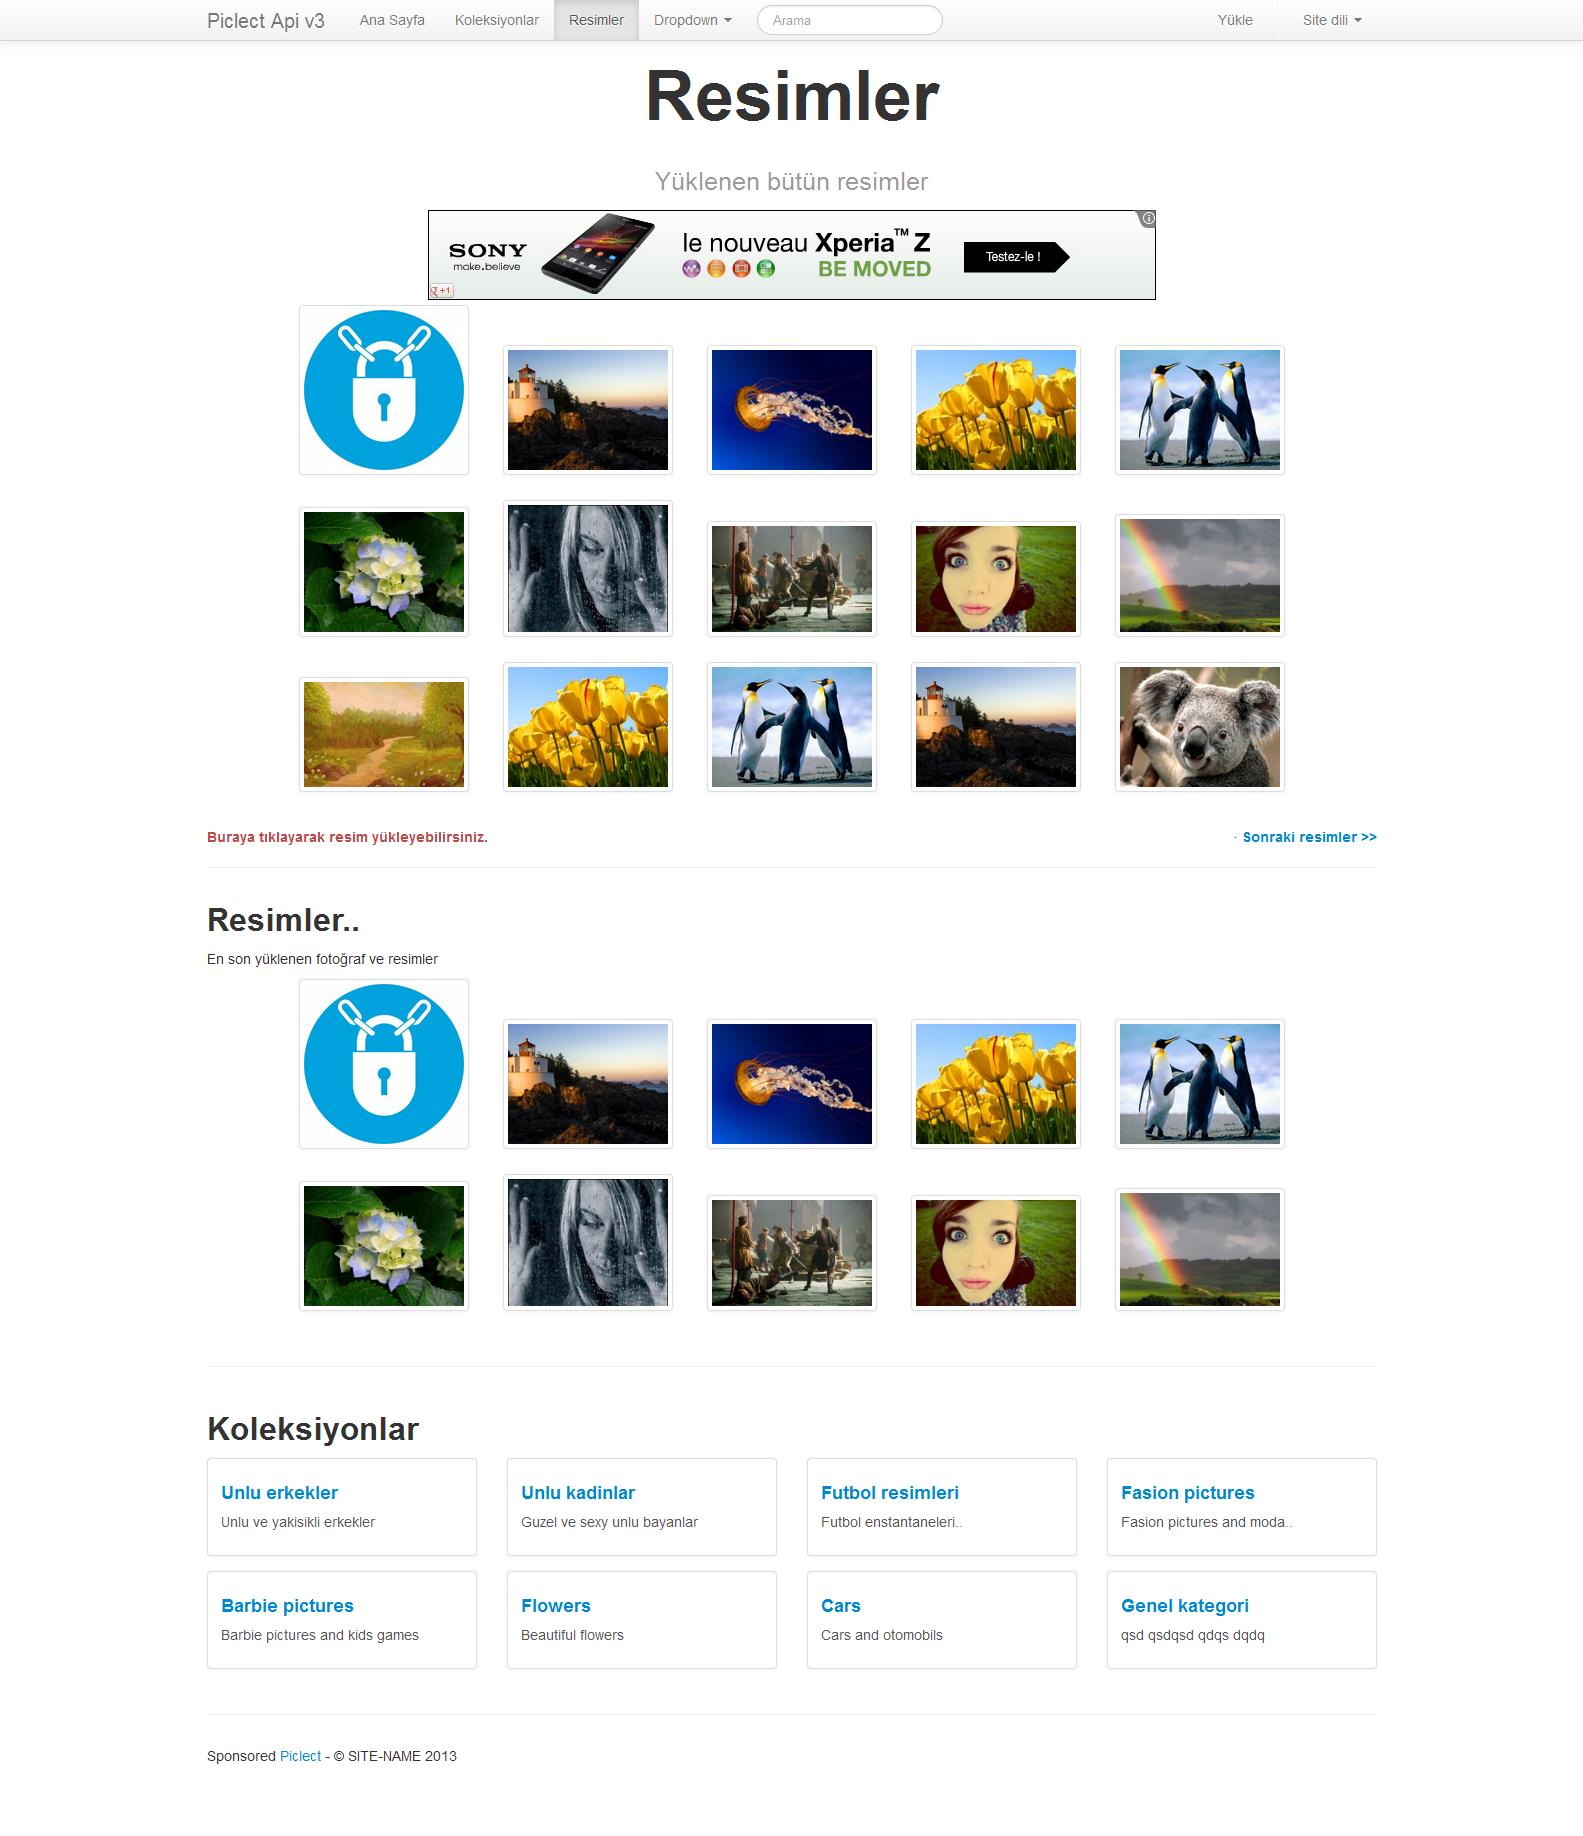 FireShot Screen Capture #012 - 'Resimler - Piclect Api v3' - piclect_com_apiPortalsmarty_photos - kuaza